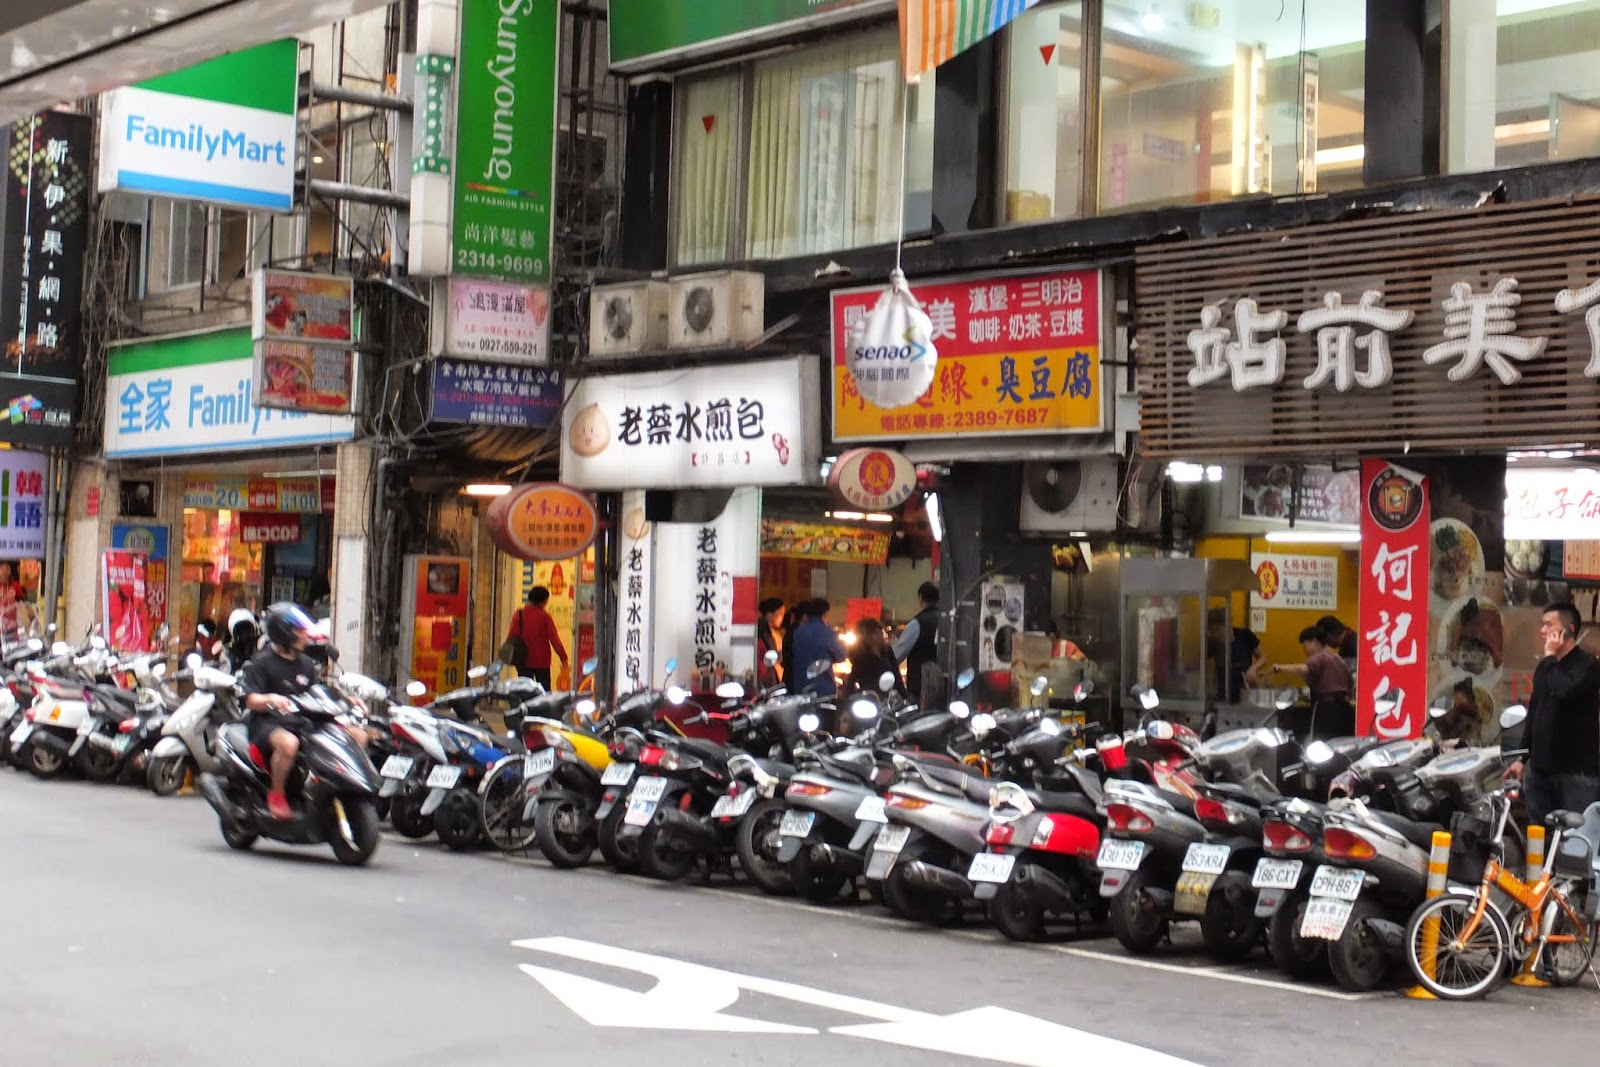 Taiwan-restaurant 台湾の食べ物商店街